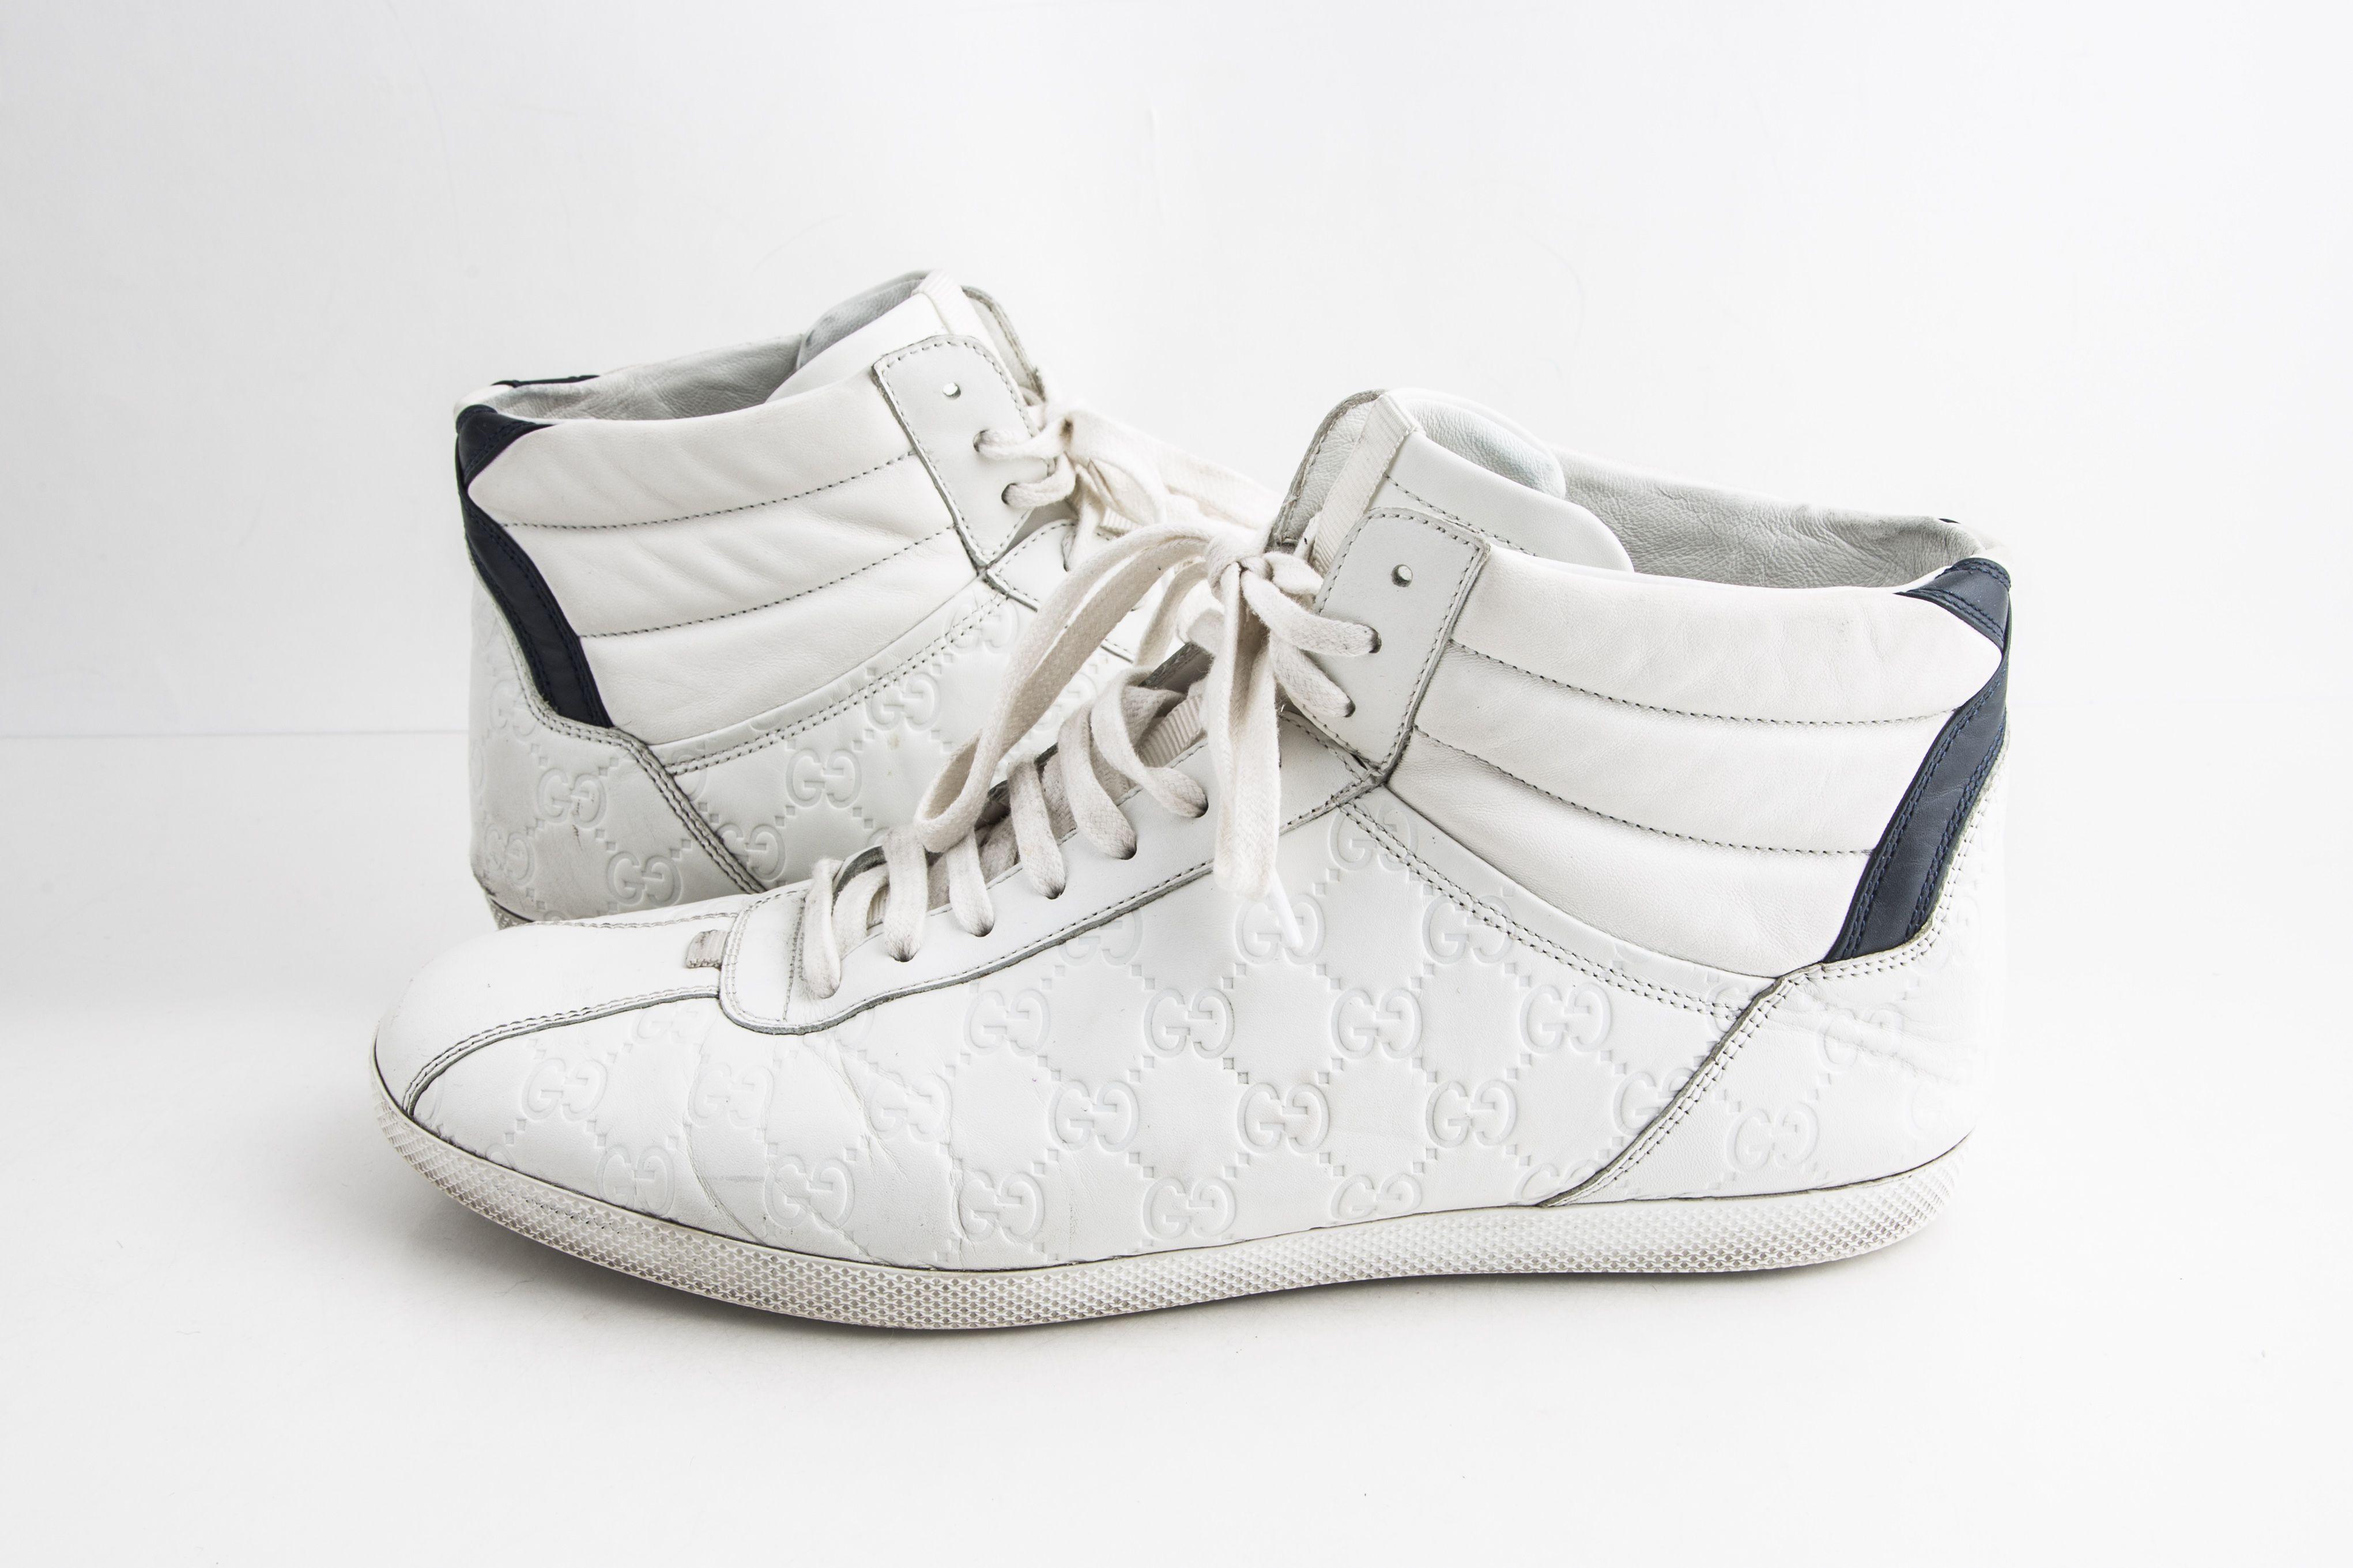 Gucci White Signature High-top Sneaker